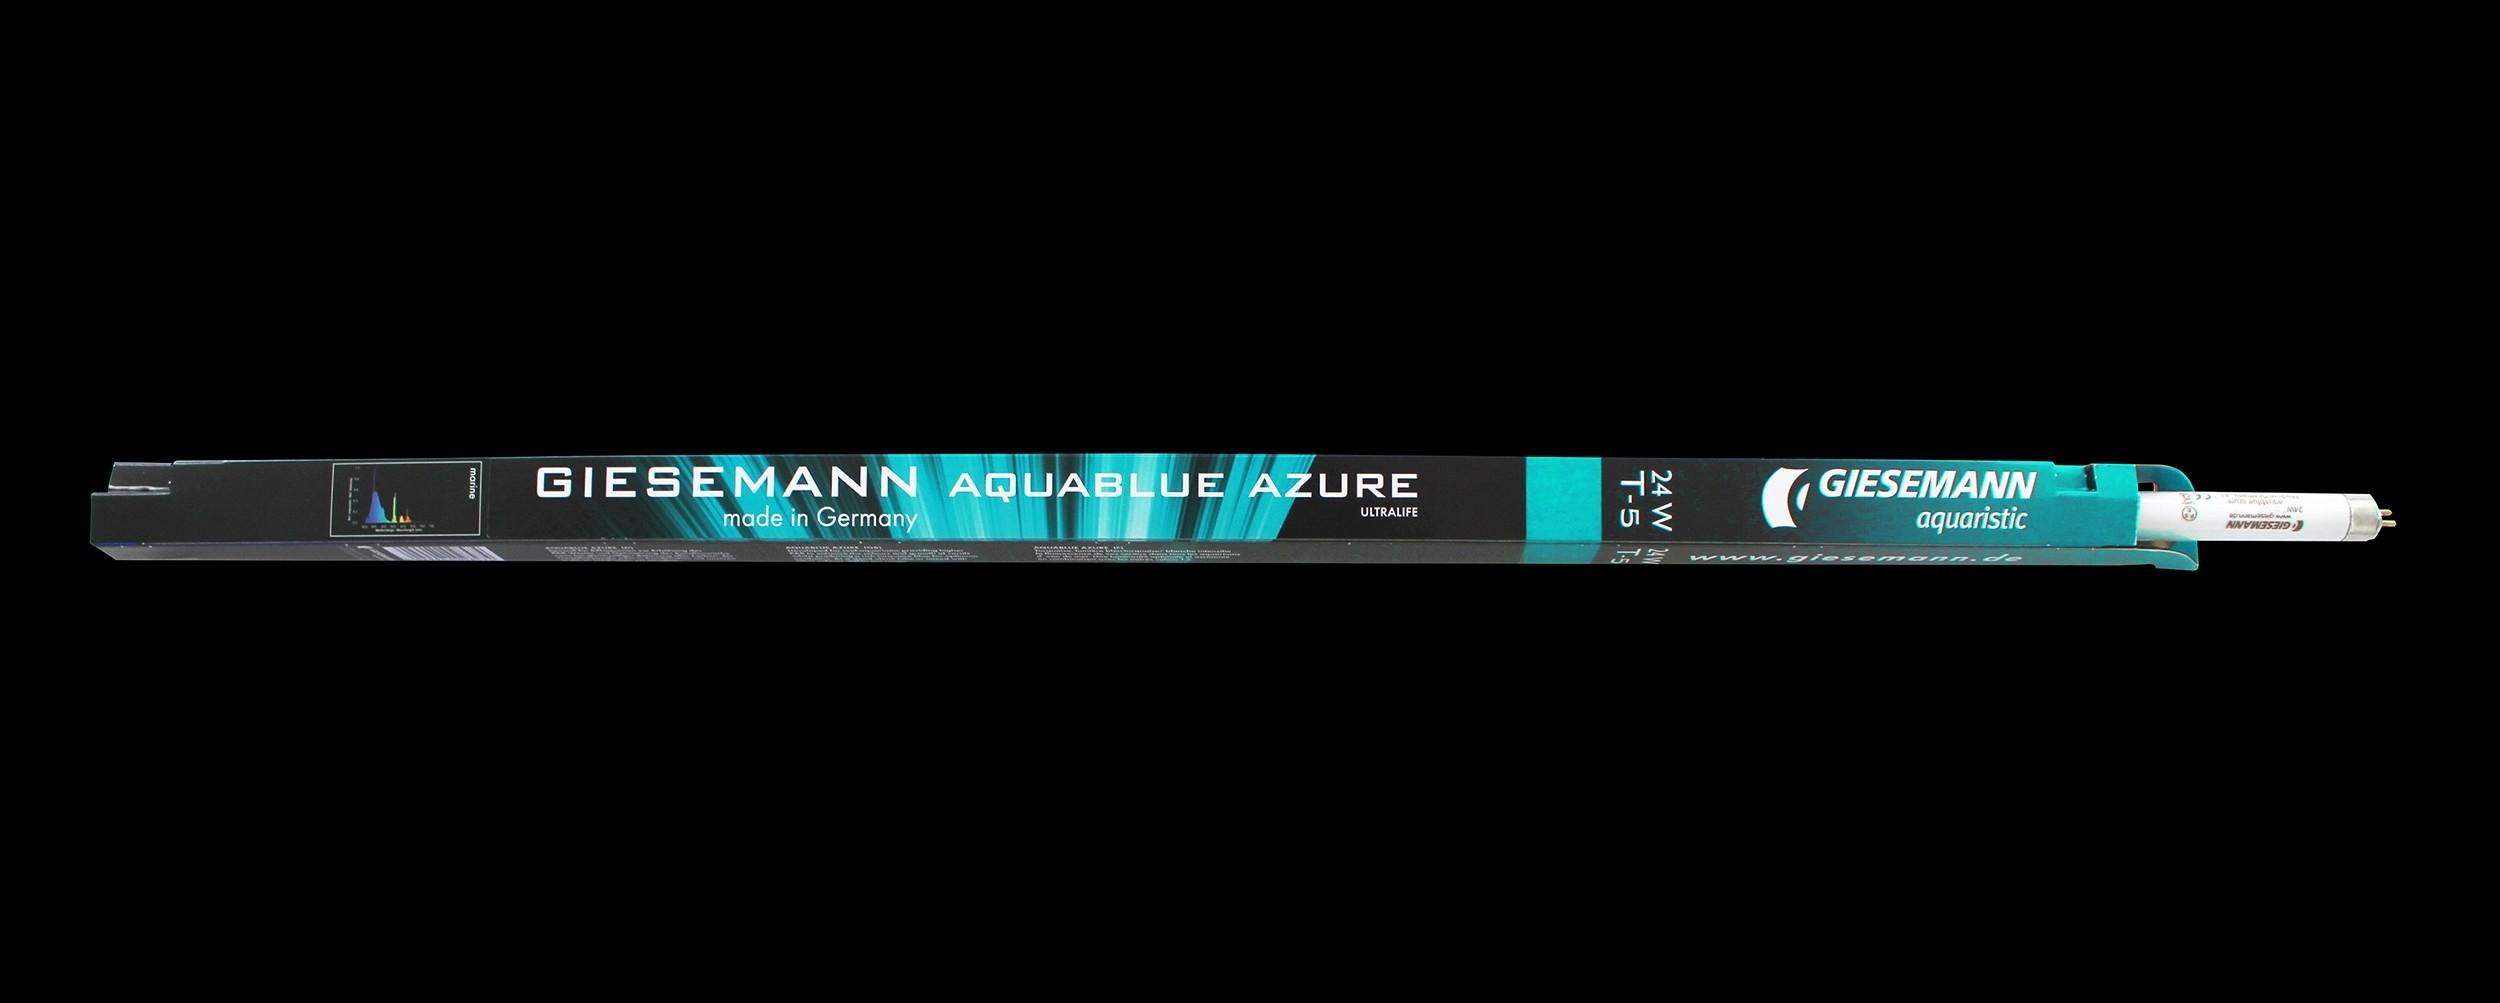 POWERCHROME T5 Aquablue Azure